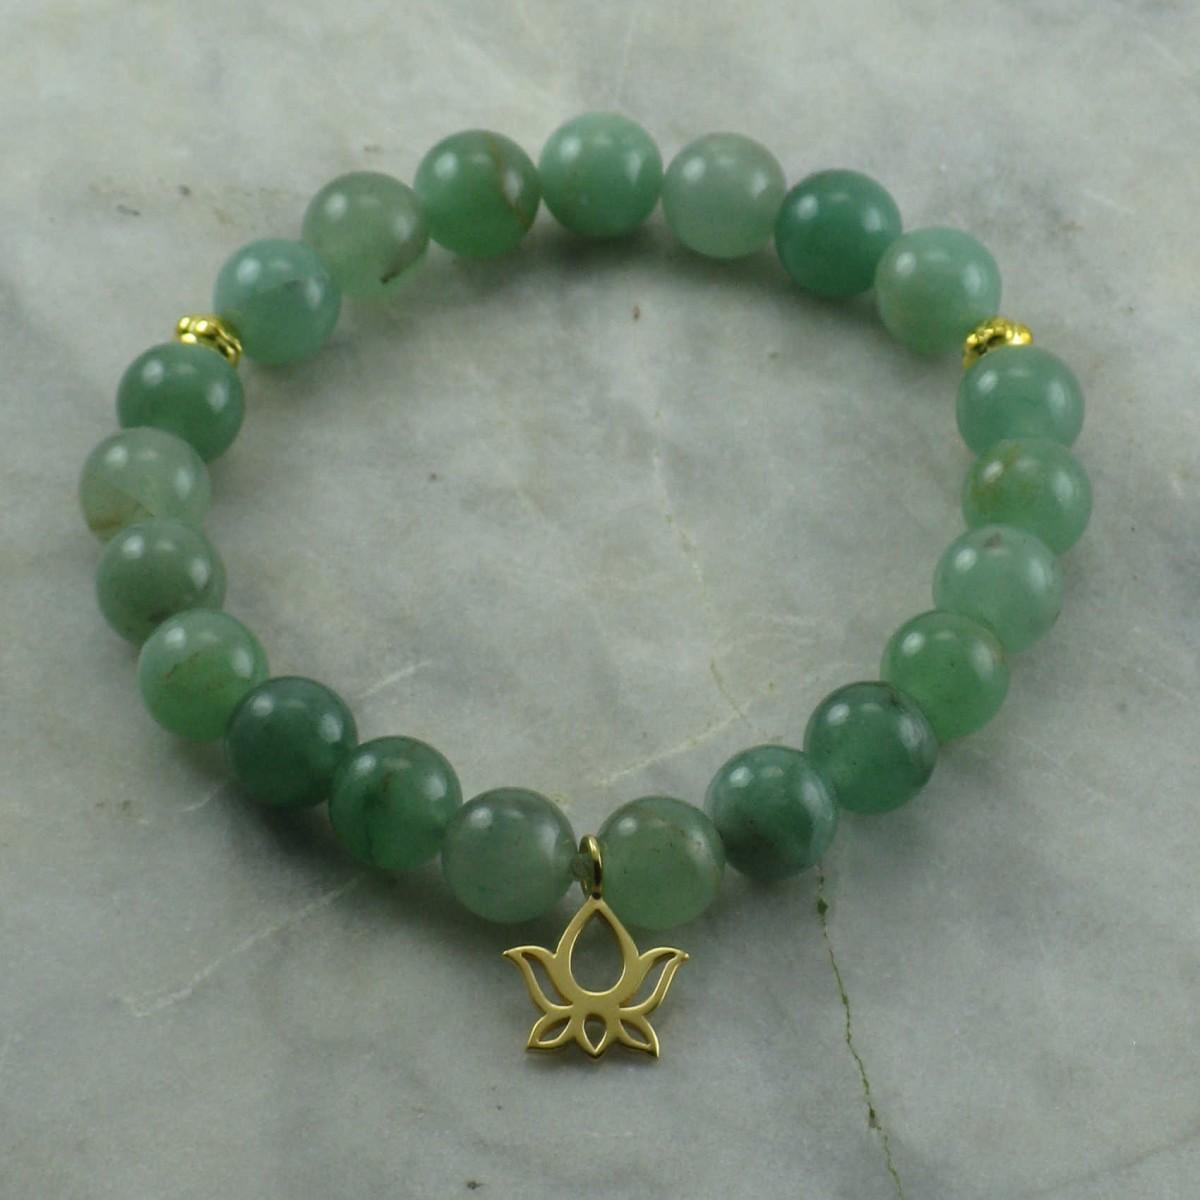 Prosperity_Mala_Bracelet_21_Green_Aventurine_Mala_Beads_1700